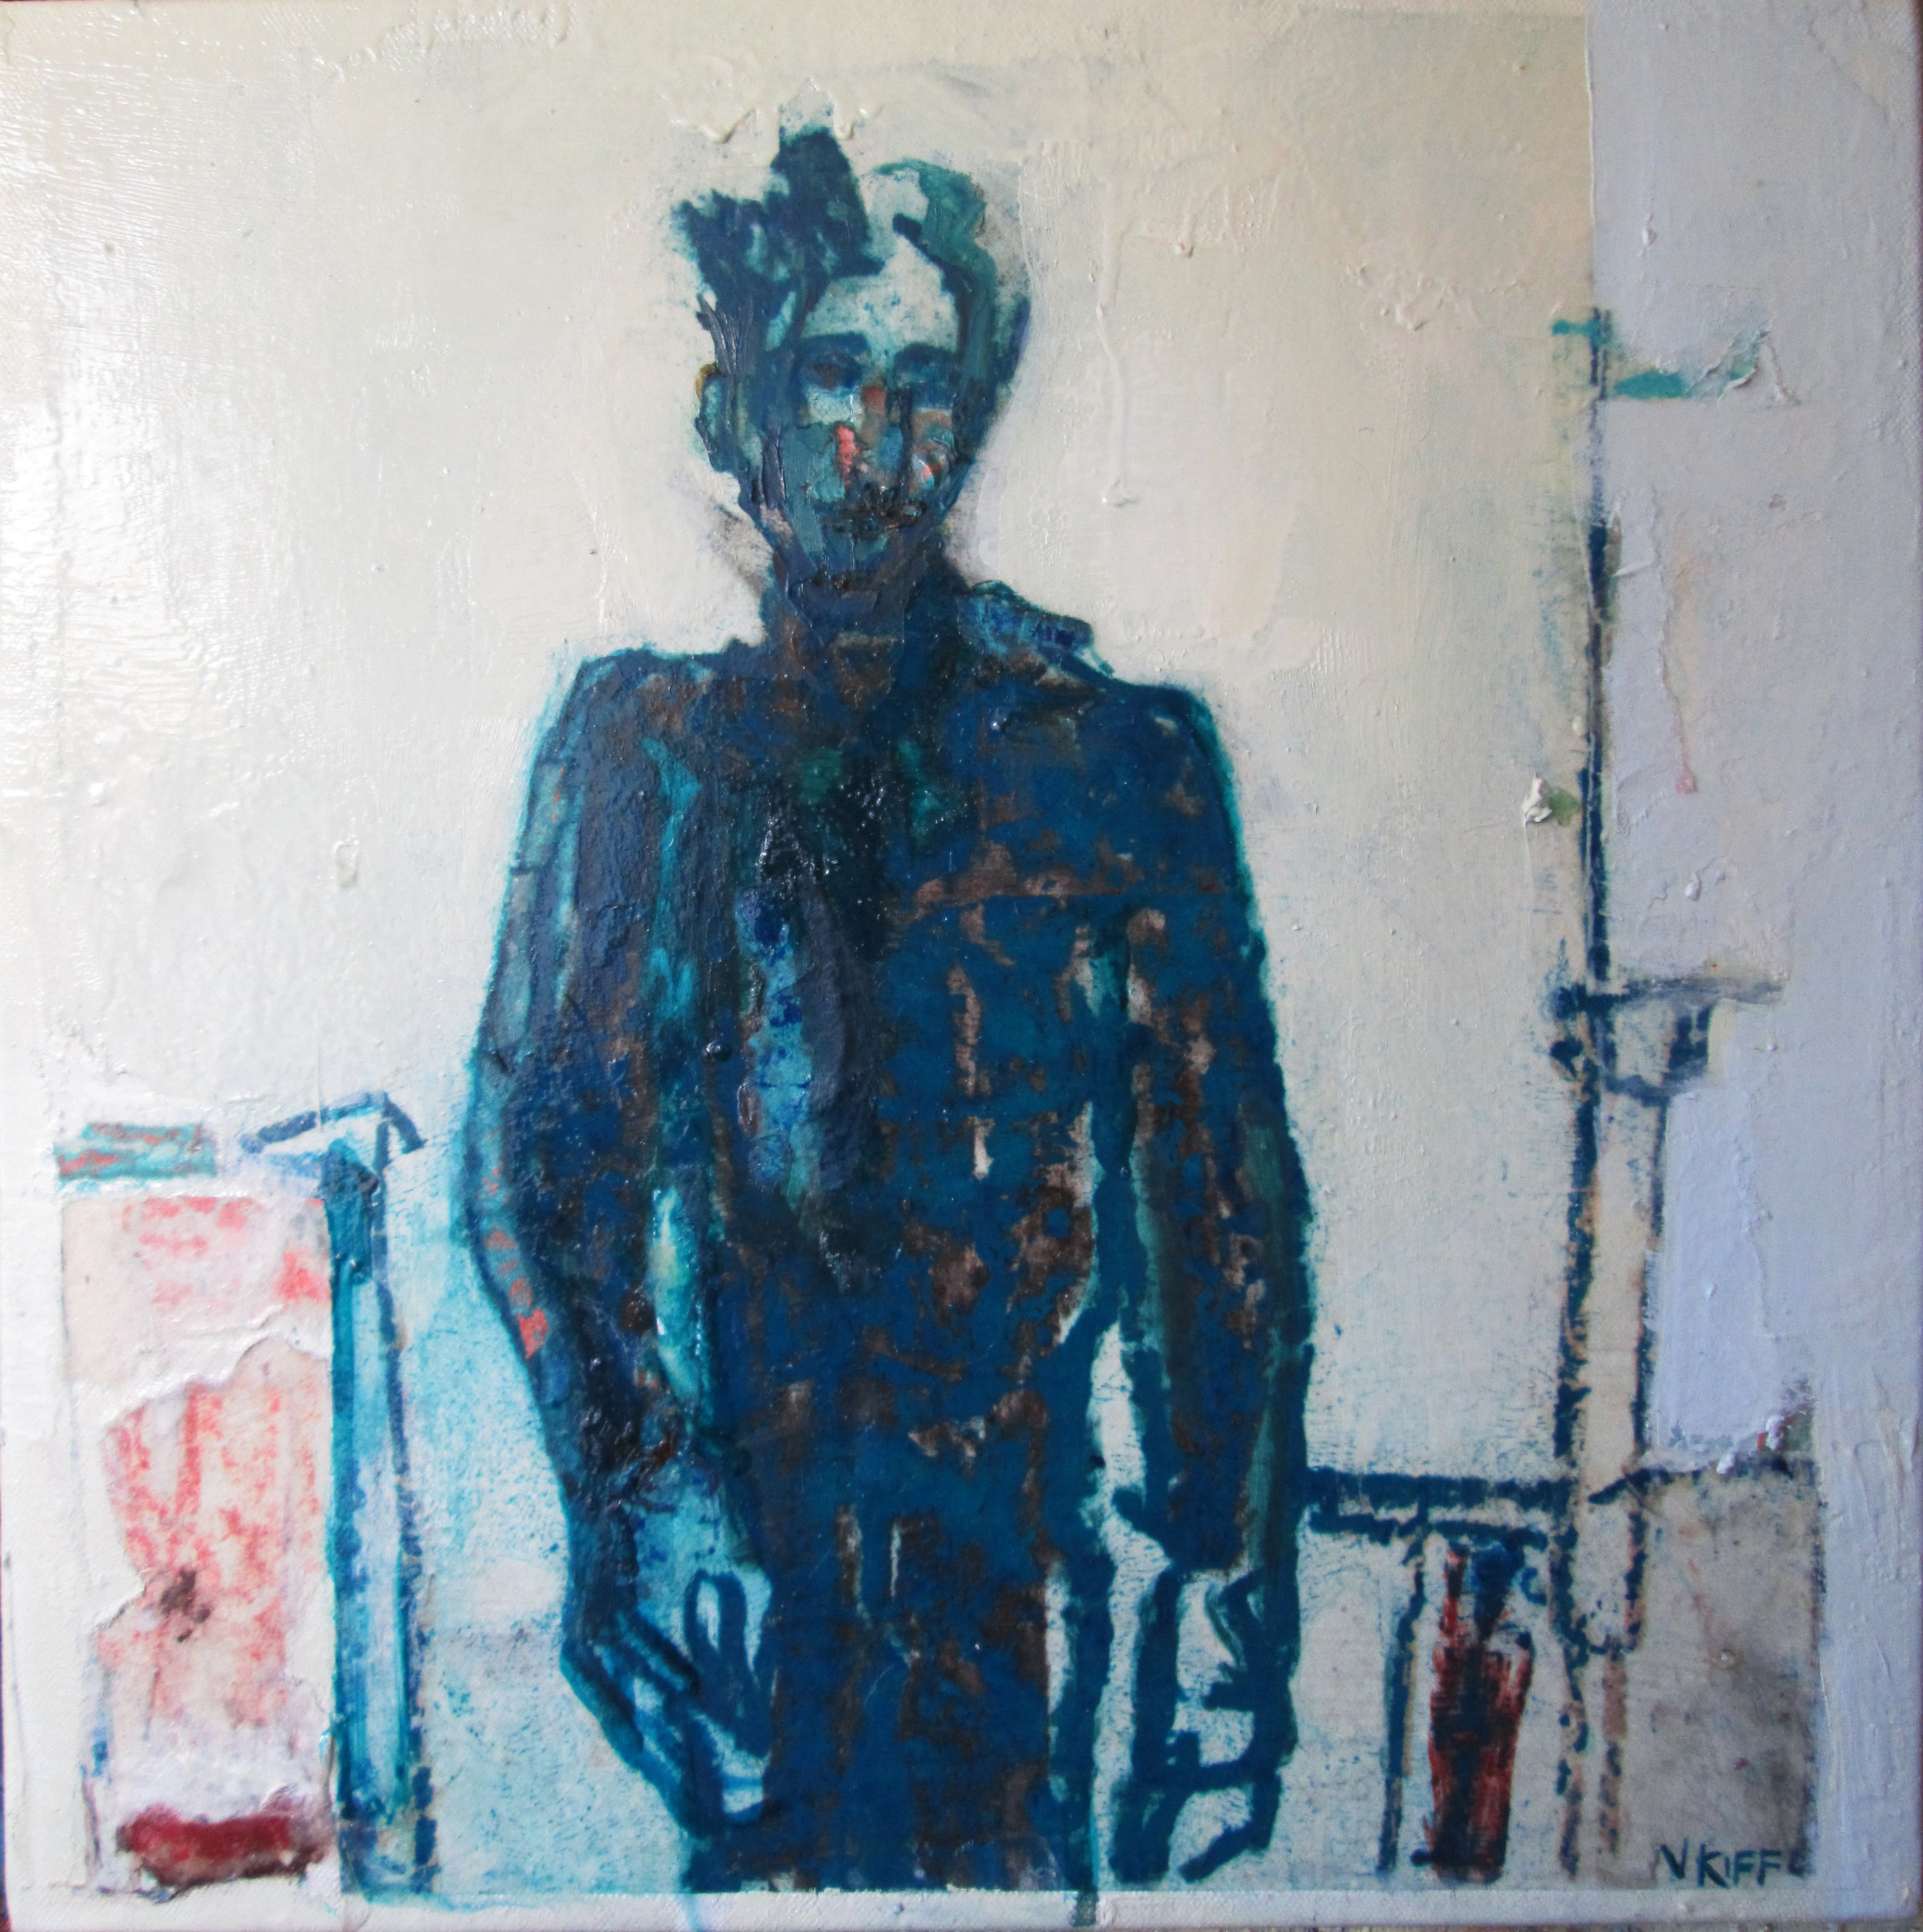 Title: The Sky Parlour  Size: 40 x 40 cm  Medium: Oil on canvas  Price: £800